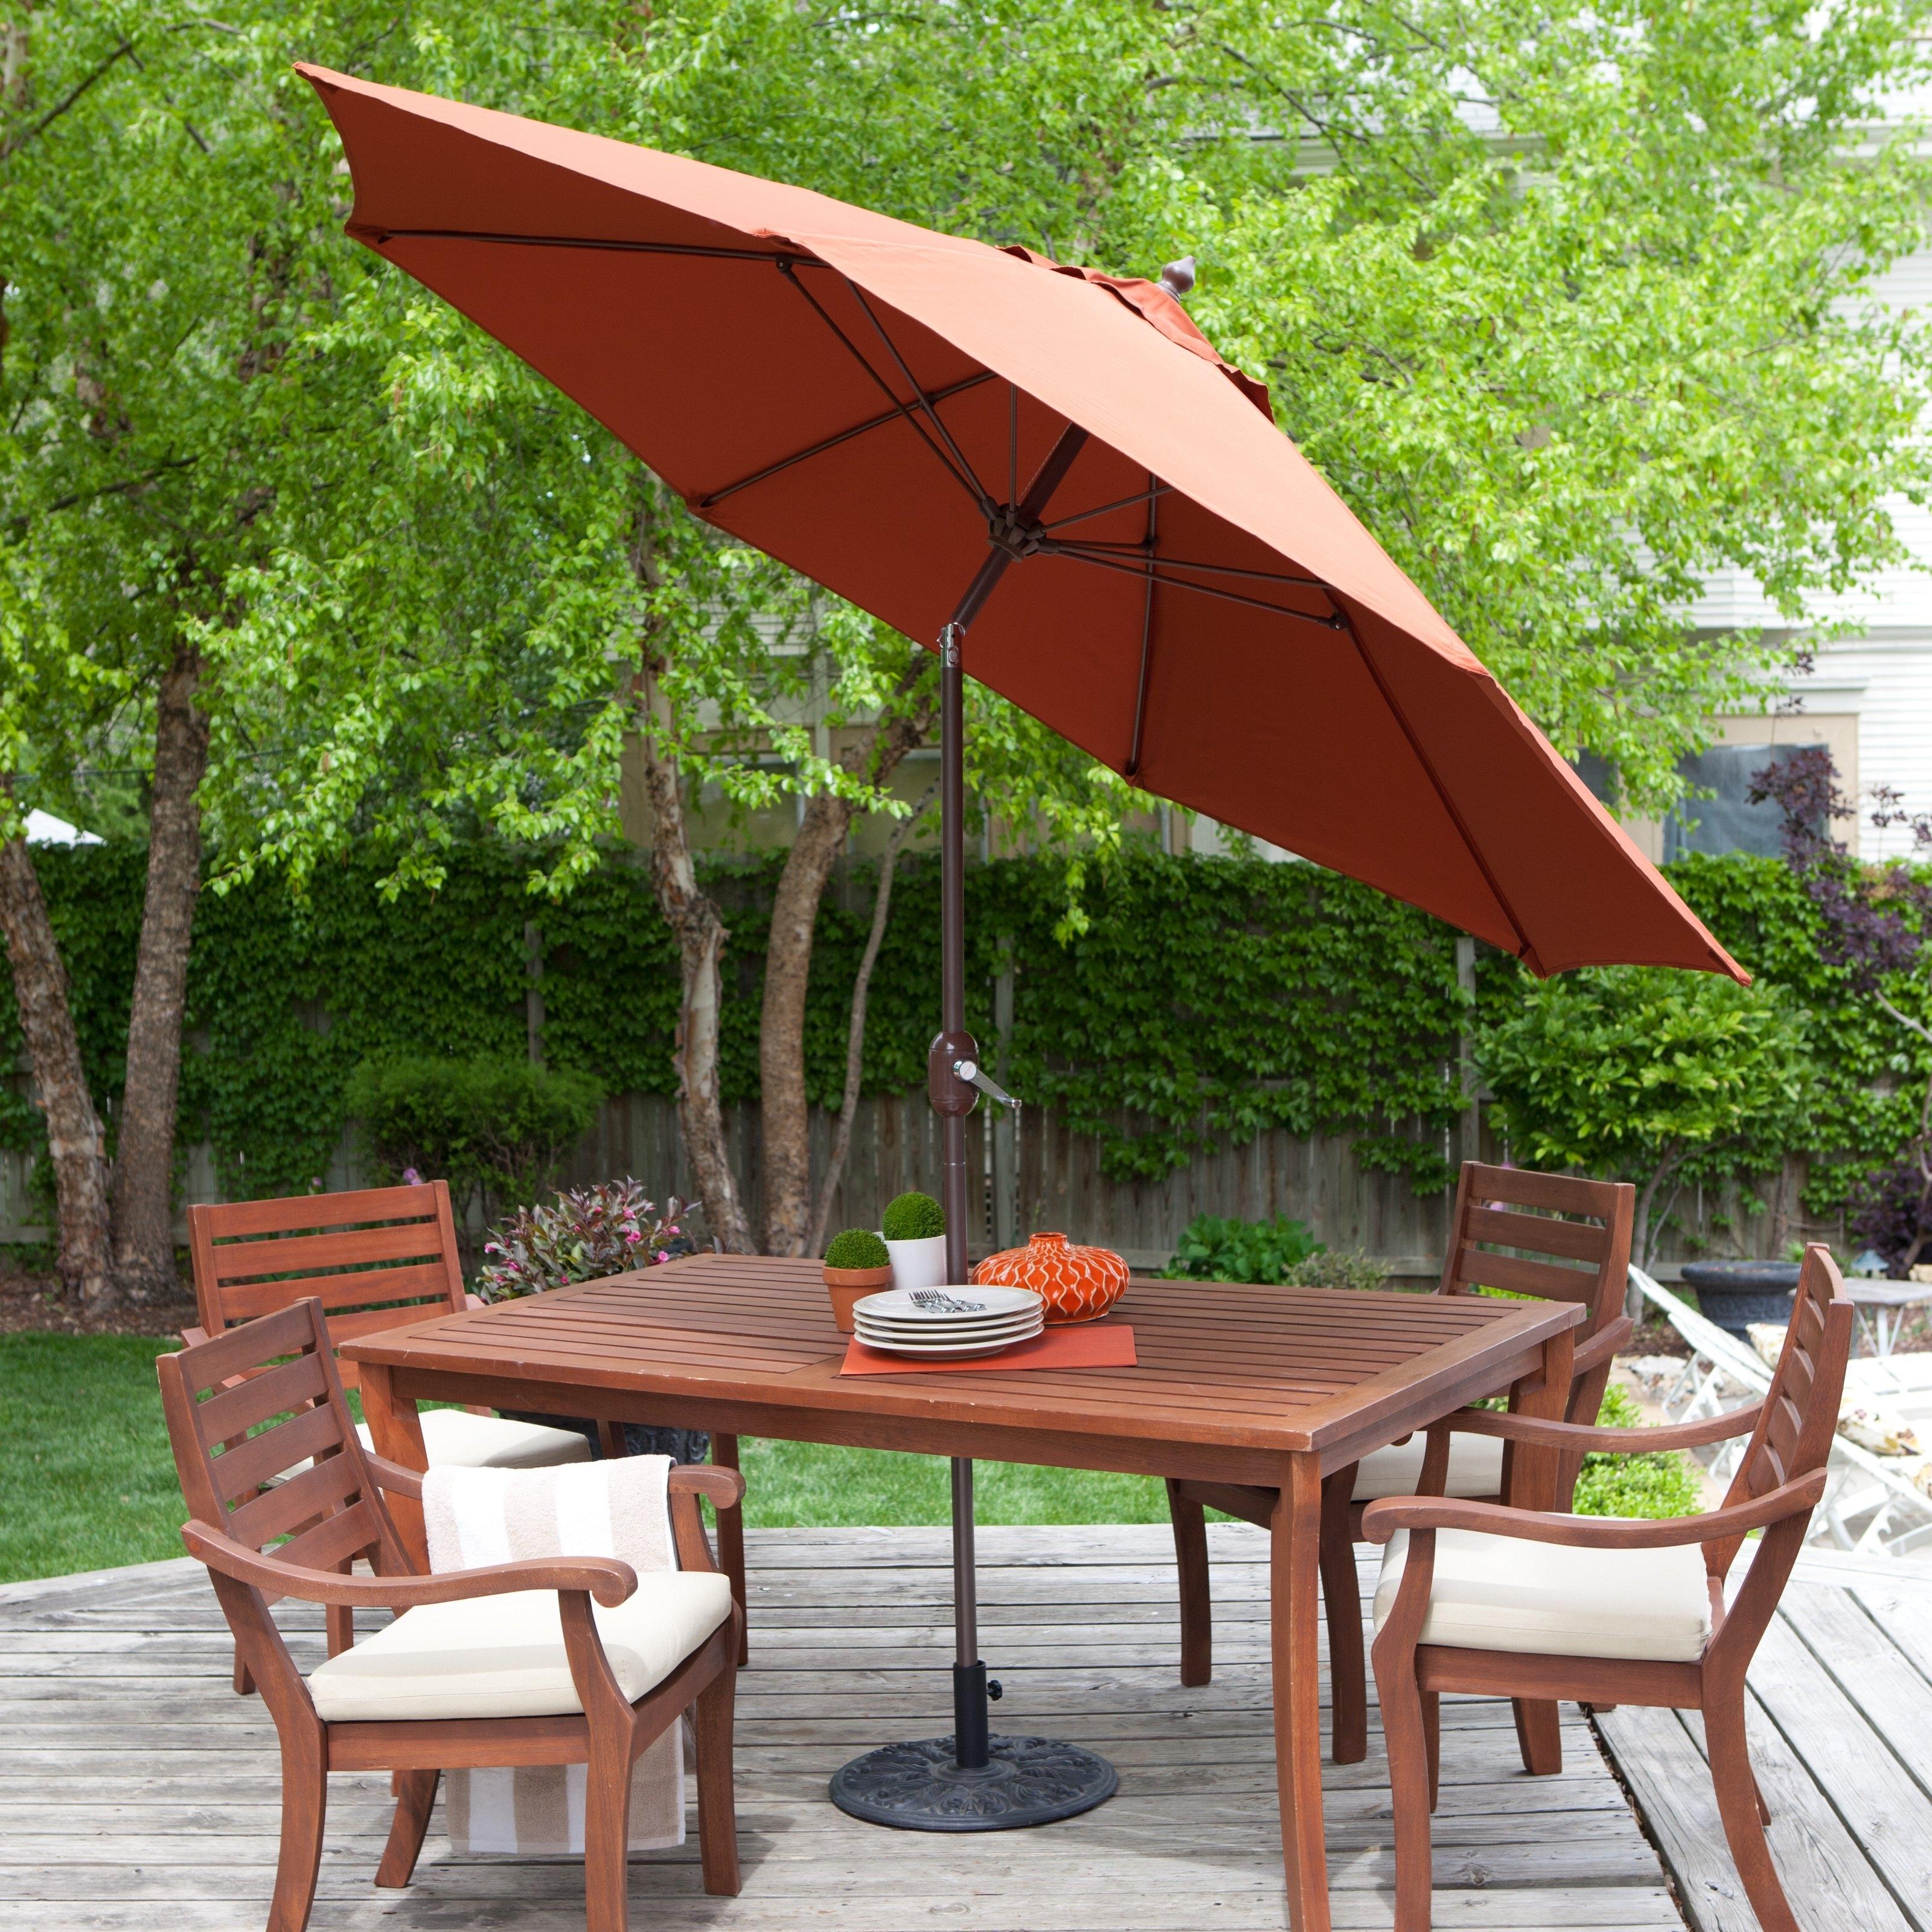 Patio Umbrellas For Tables With Regard To 2018 Galtech Sunbrella 11 Ft (View 4 of 20)